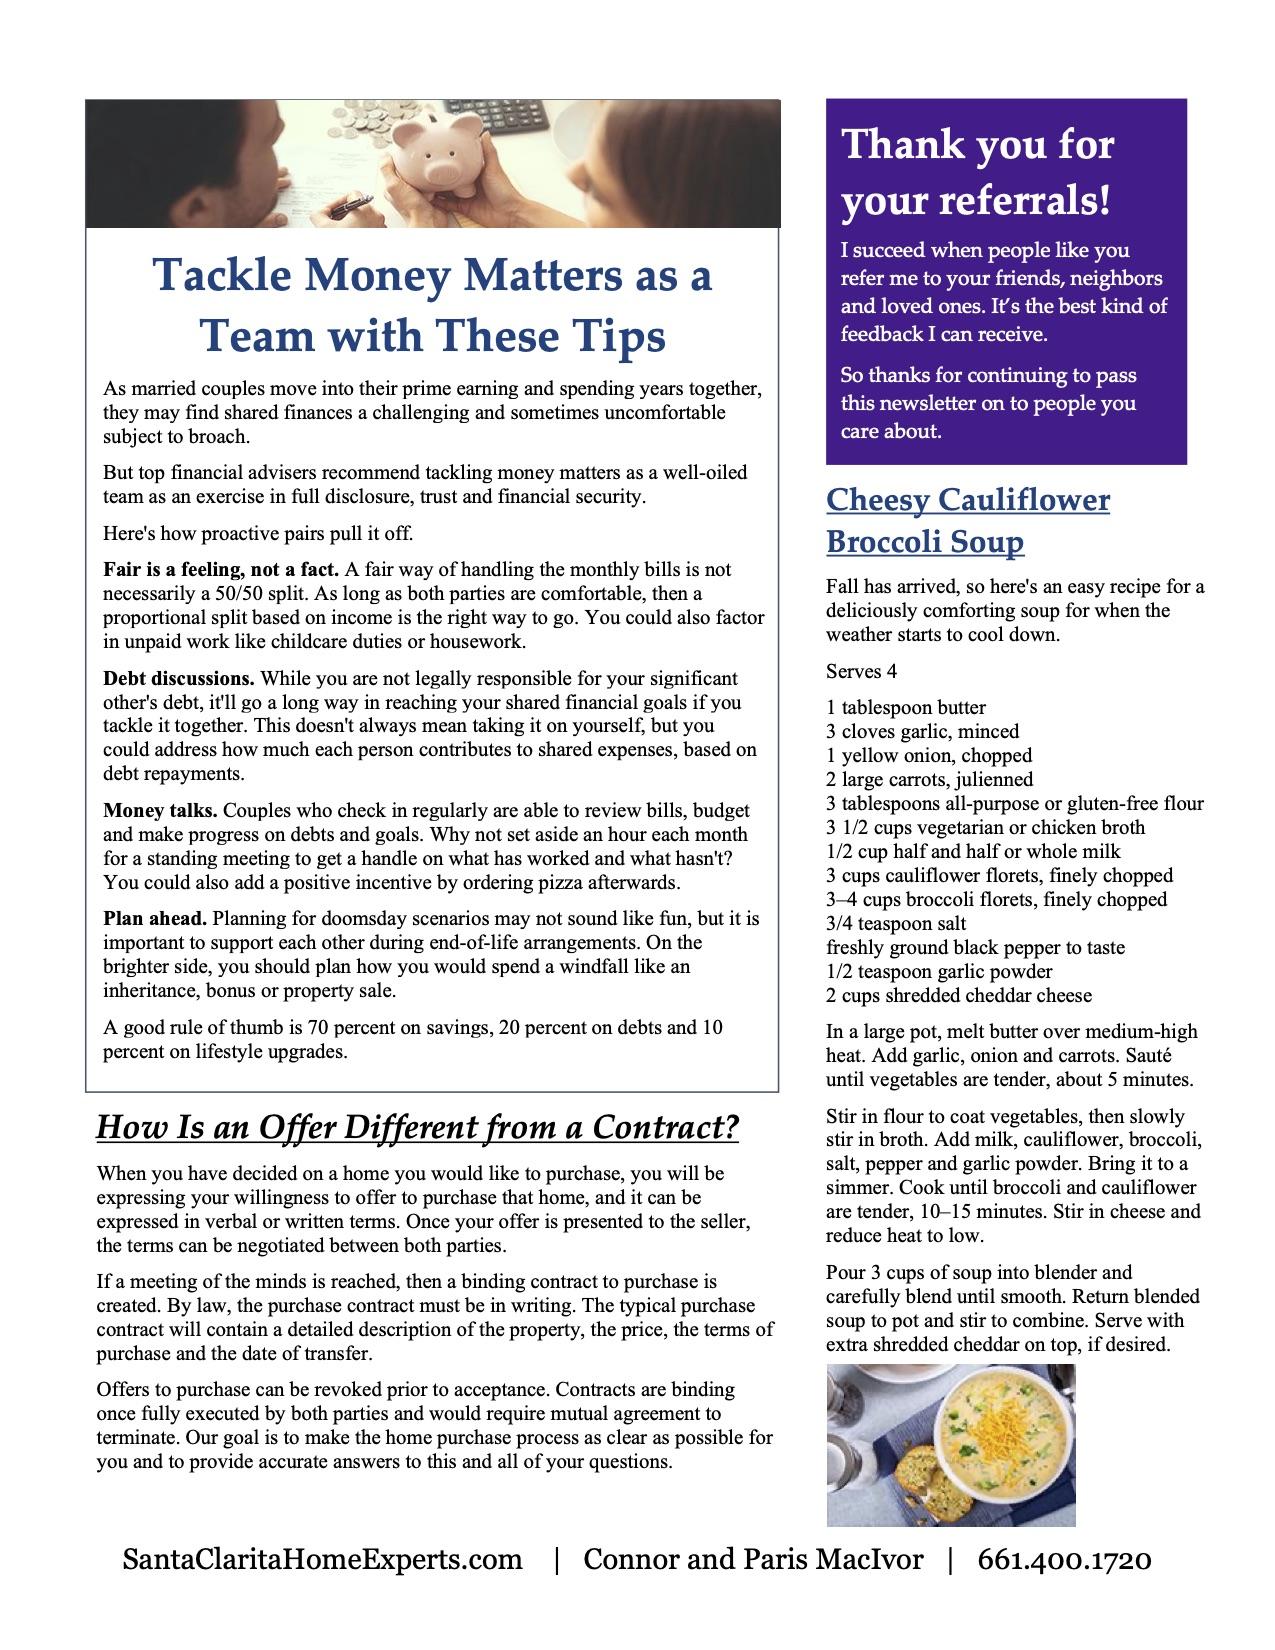 Santa Clarita newsletter page 2